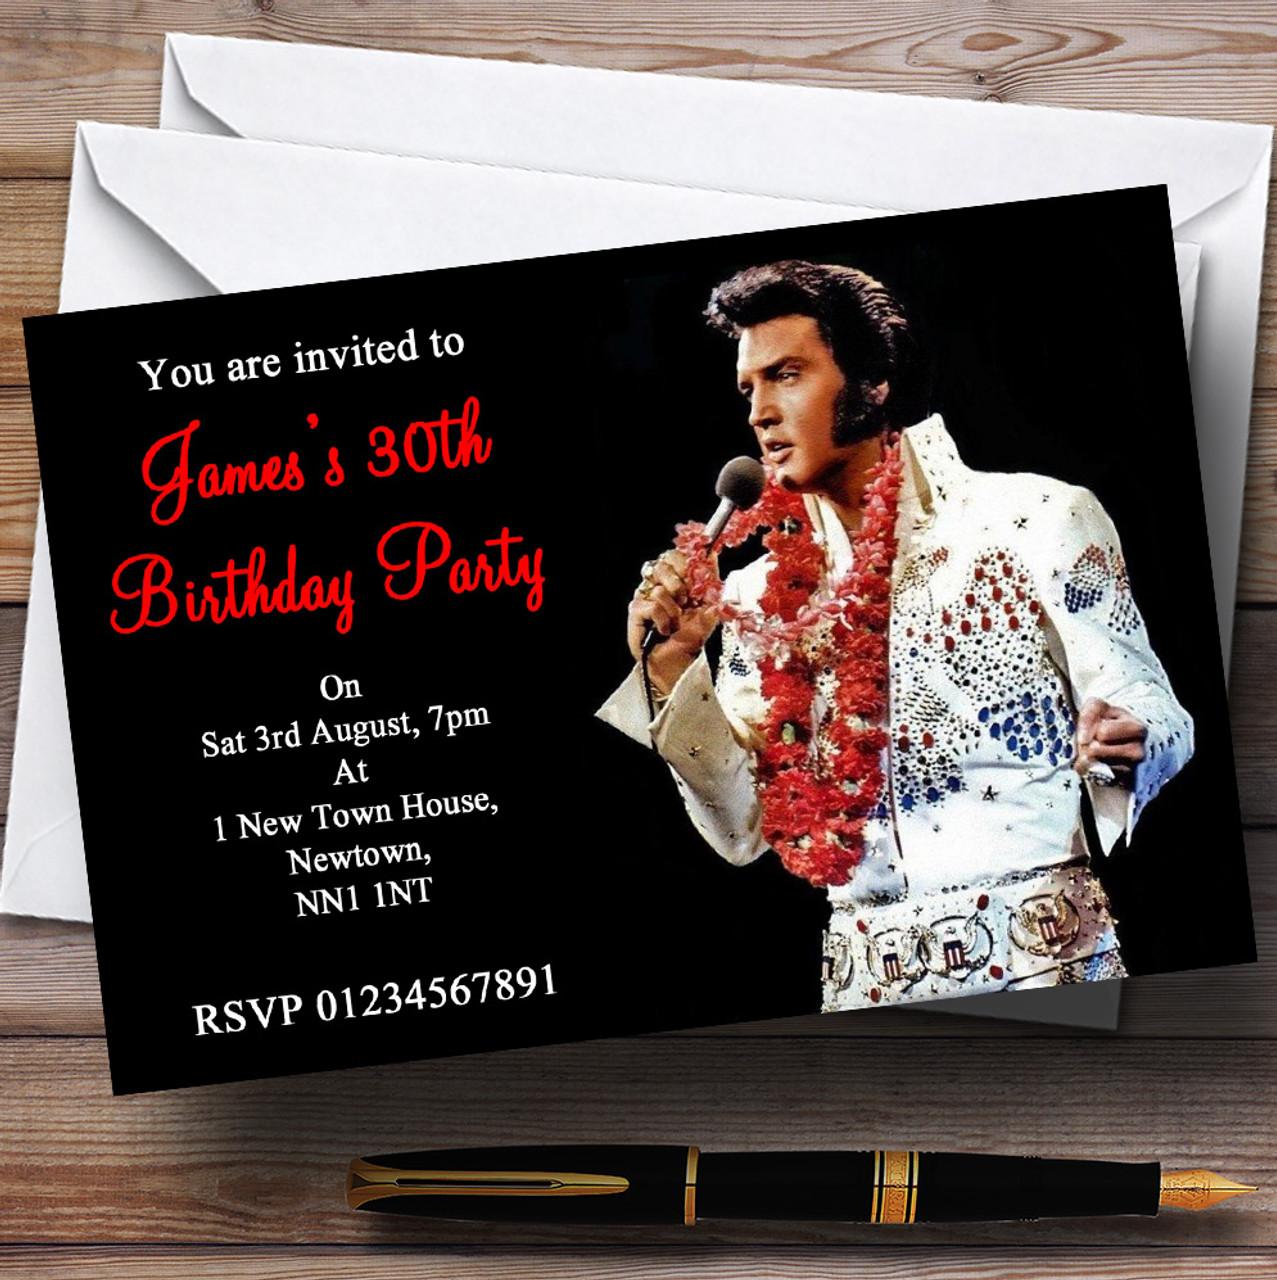 Elvis presley red personalised party invitations the card zoo elvis presley red personalised party invitations filmwisefo